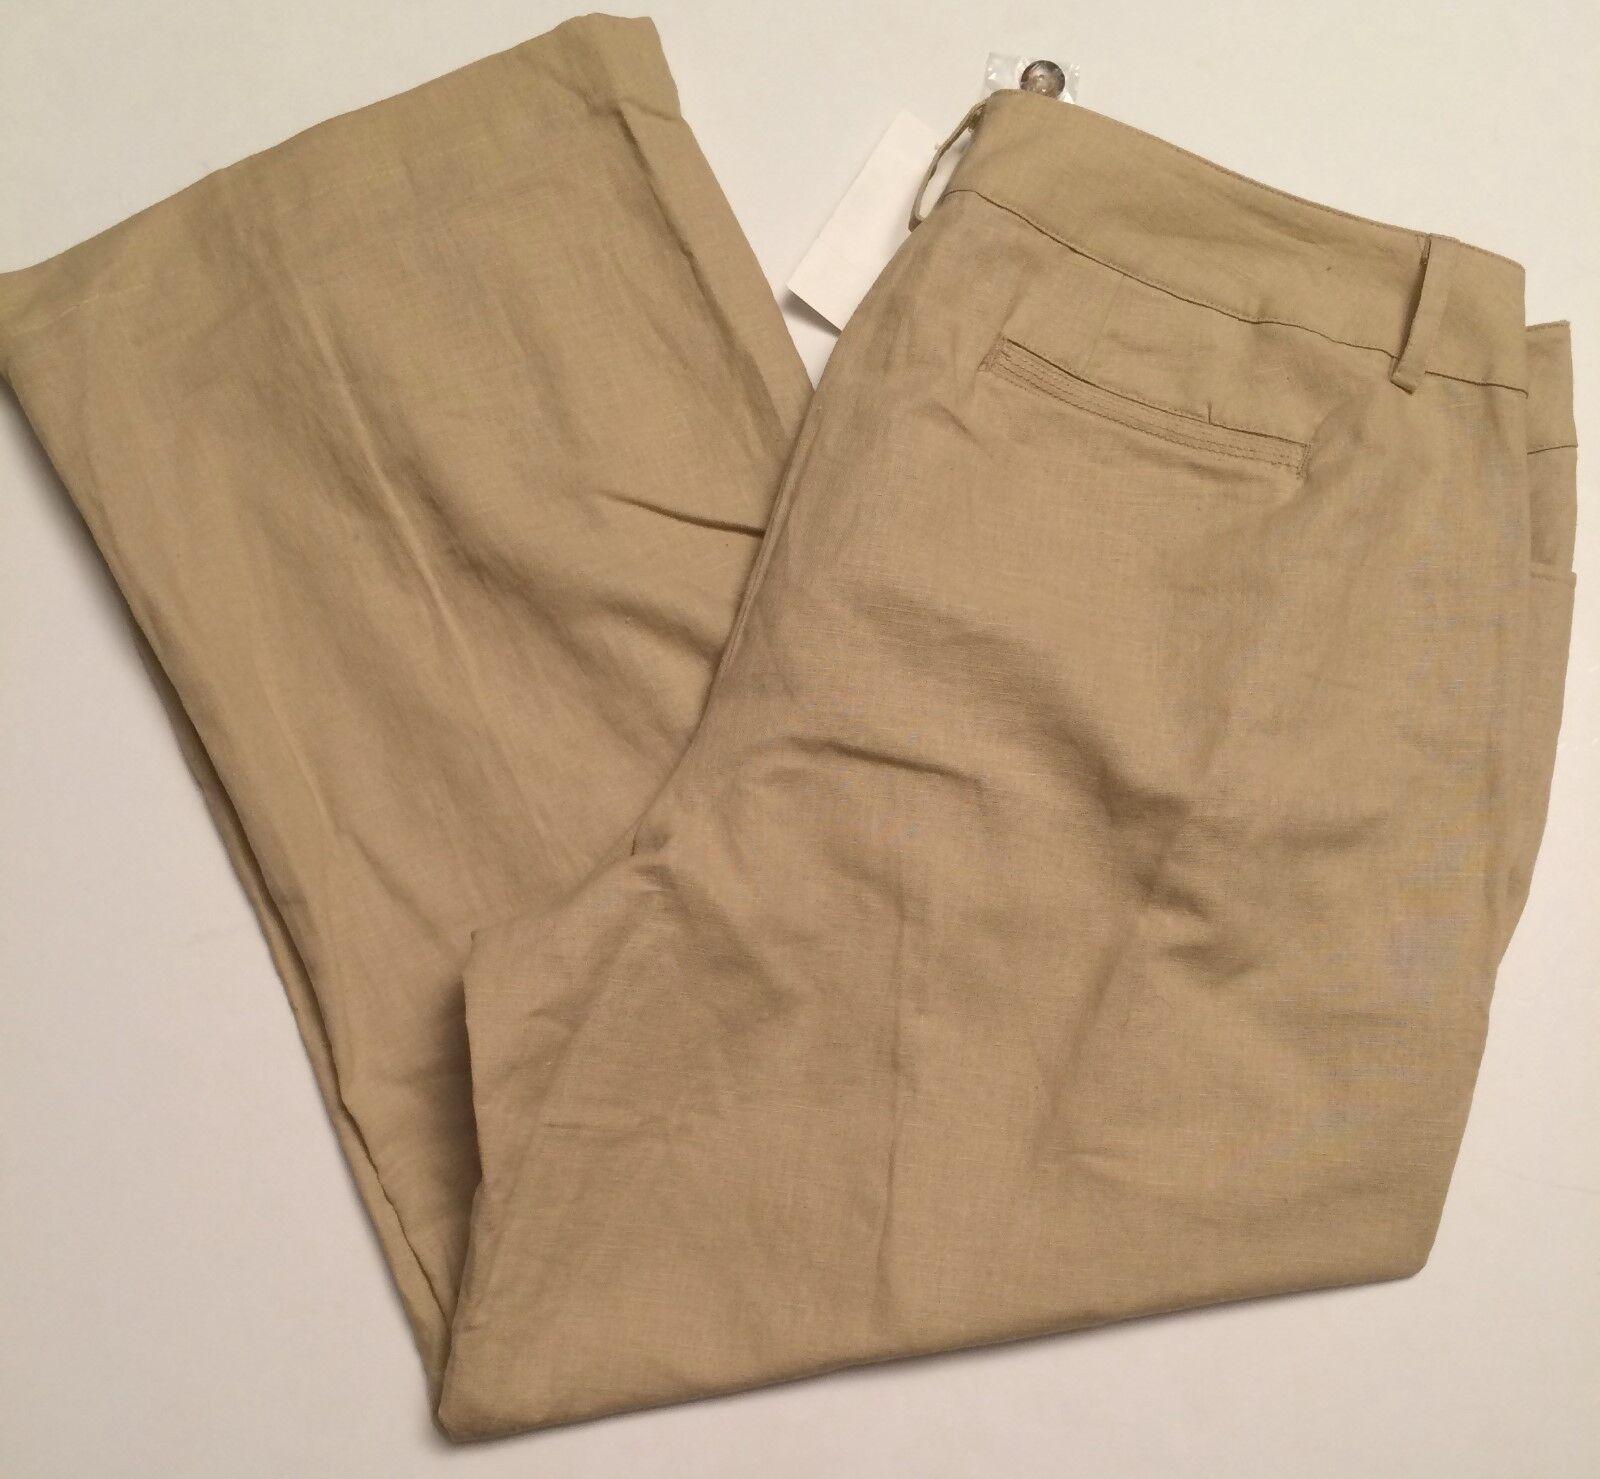 Lane Bryant Pants Womens Size 18 Beige Linen Blend Flat Button Zipper Front NWT